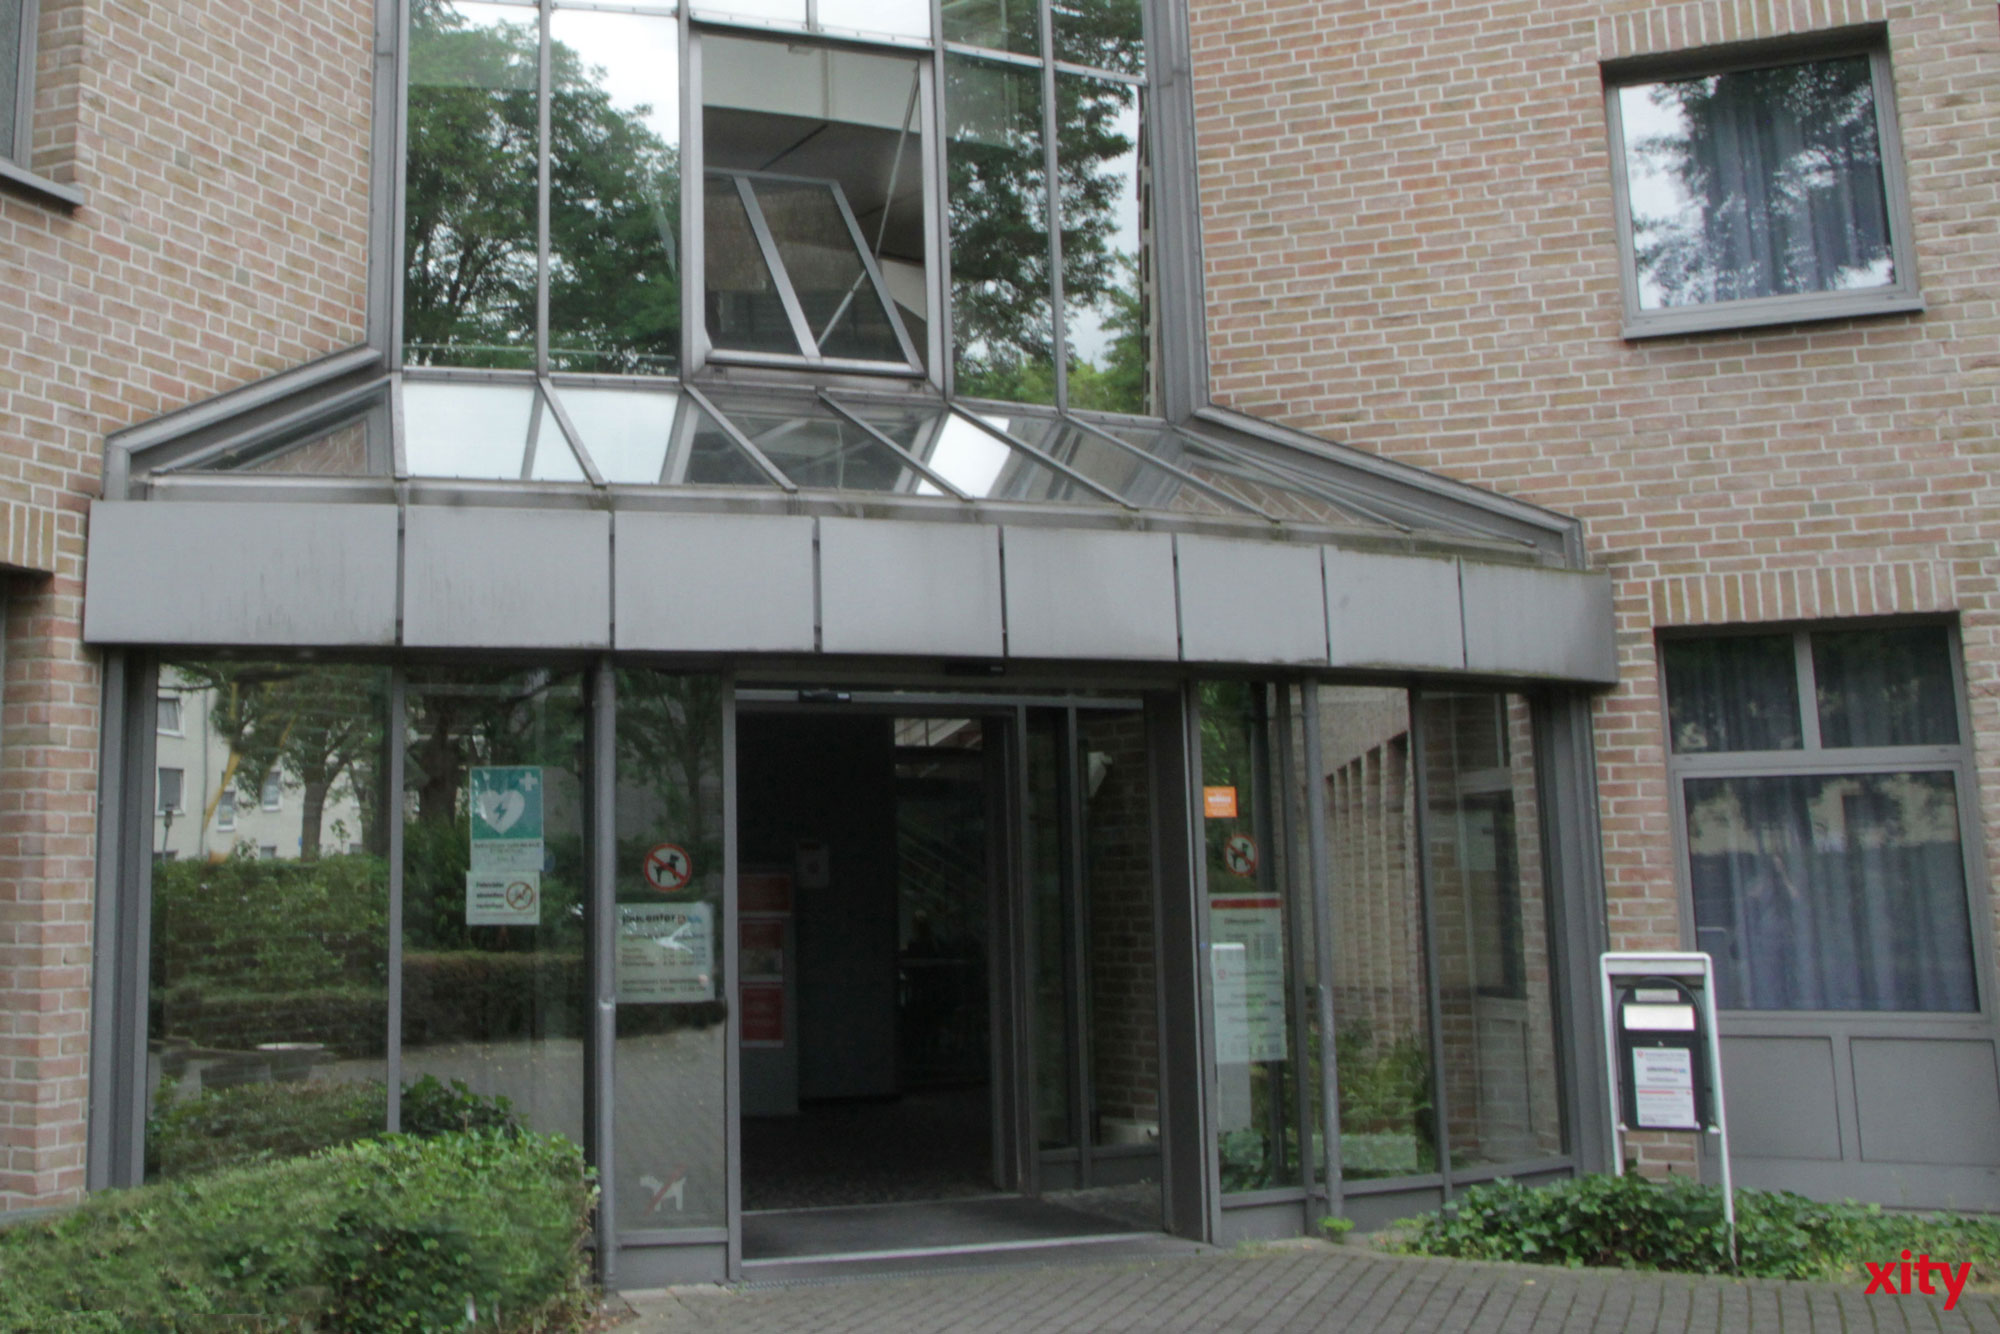 Agentur für Arbeit Krefeld, Philadelphiastr. 2, 47799 Krefeld. (Foto: xity)